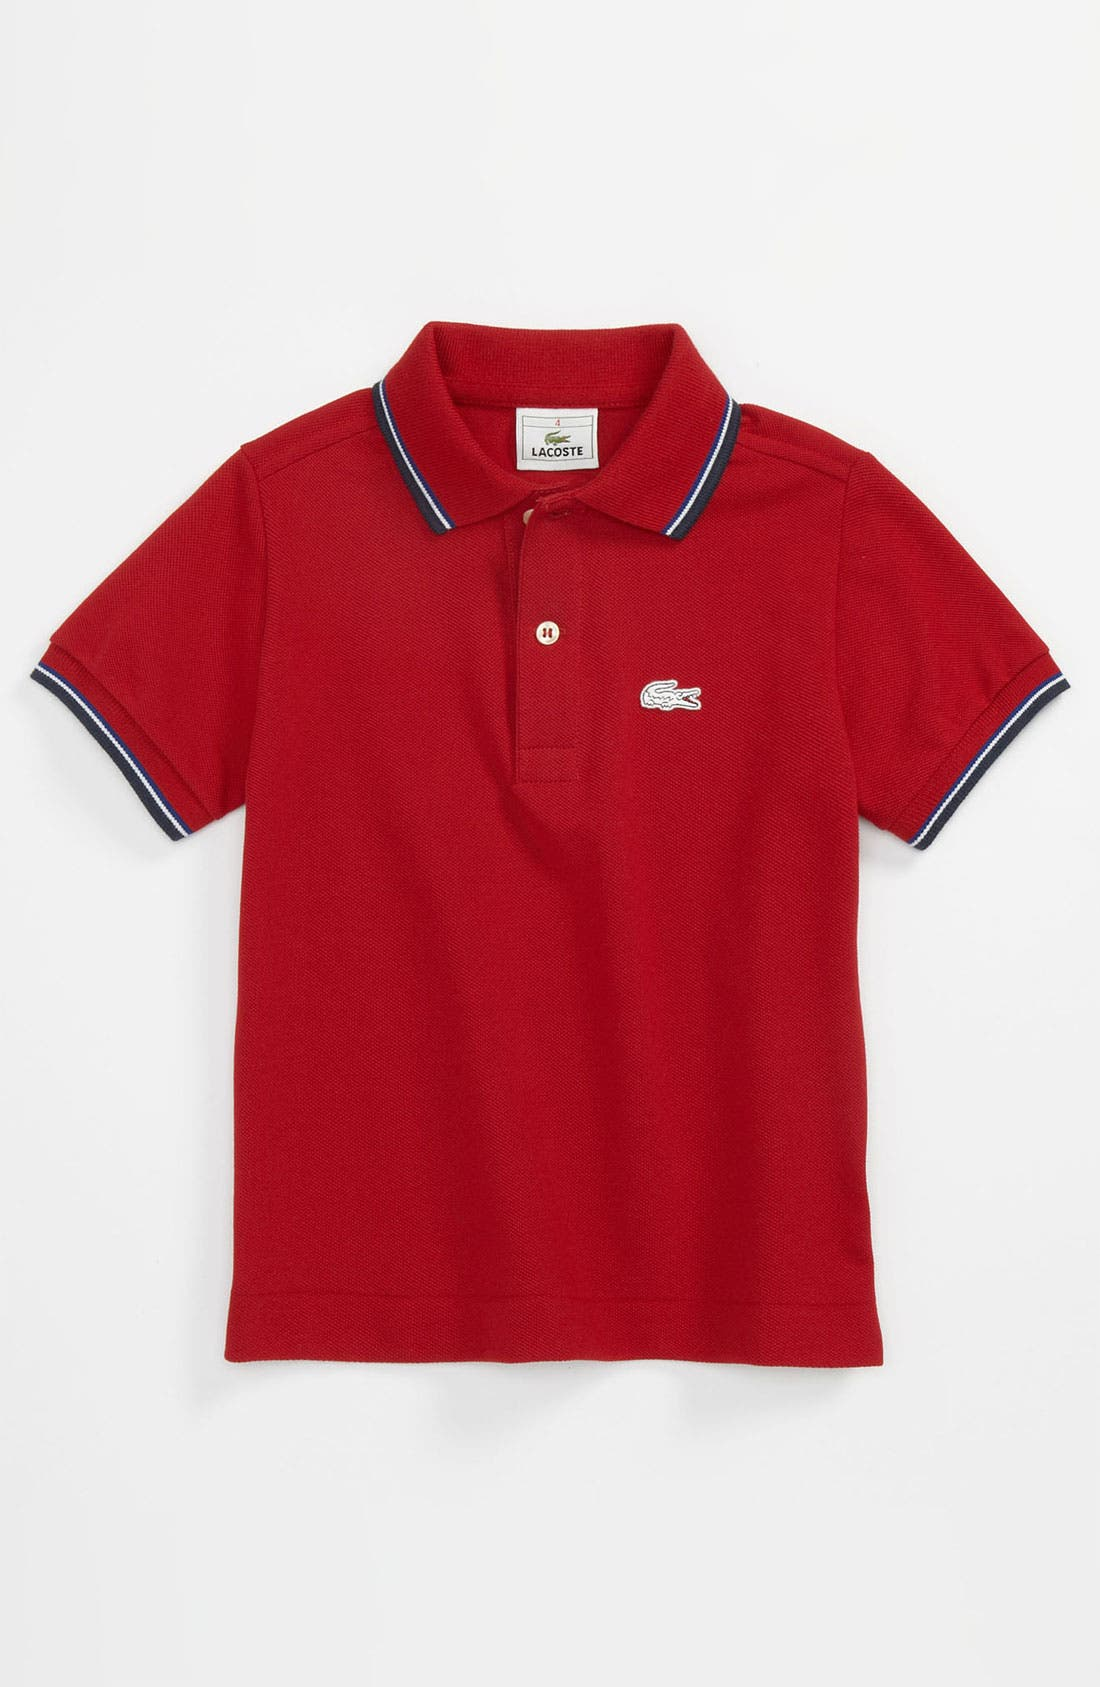 Main Image - Lacoste Piqué Knit Polo Shirt (Toddler)